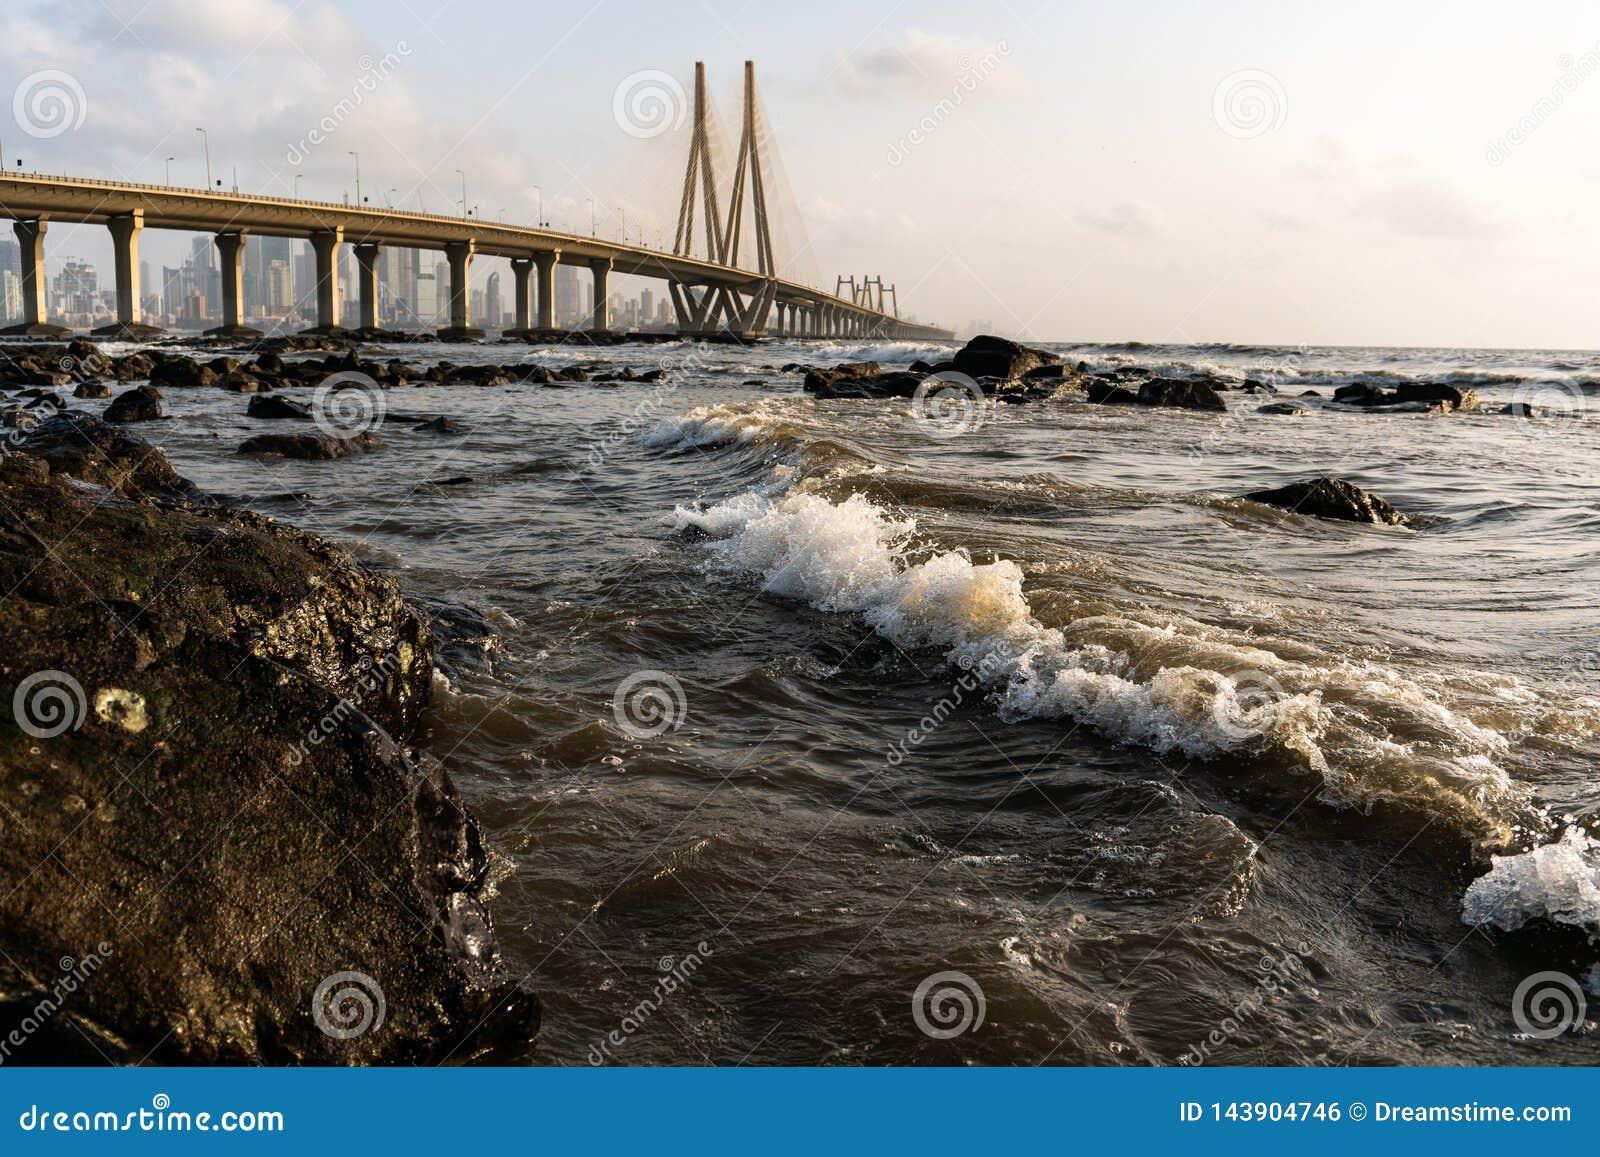 Bandra - Worli Sea Link.